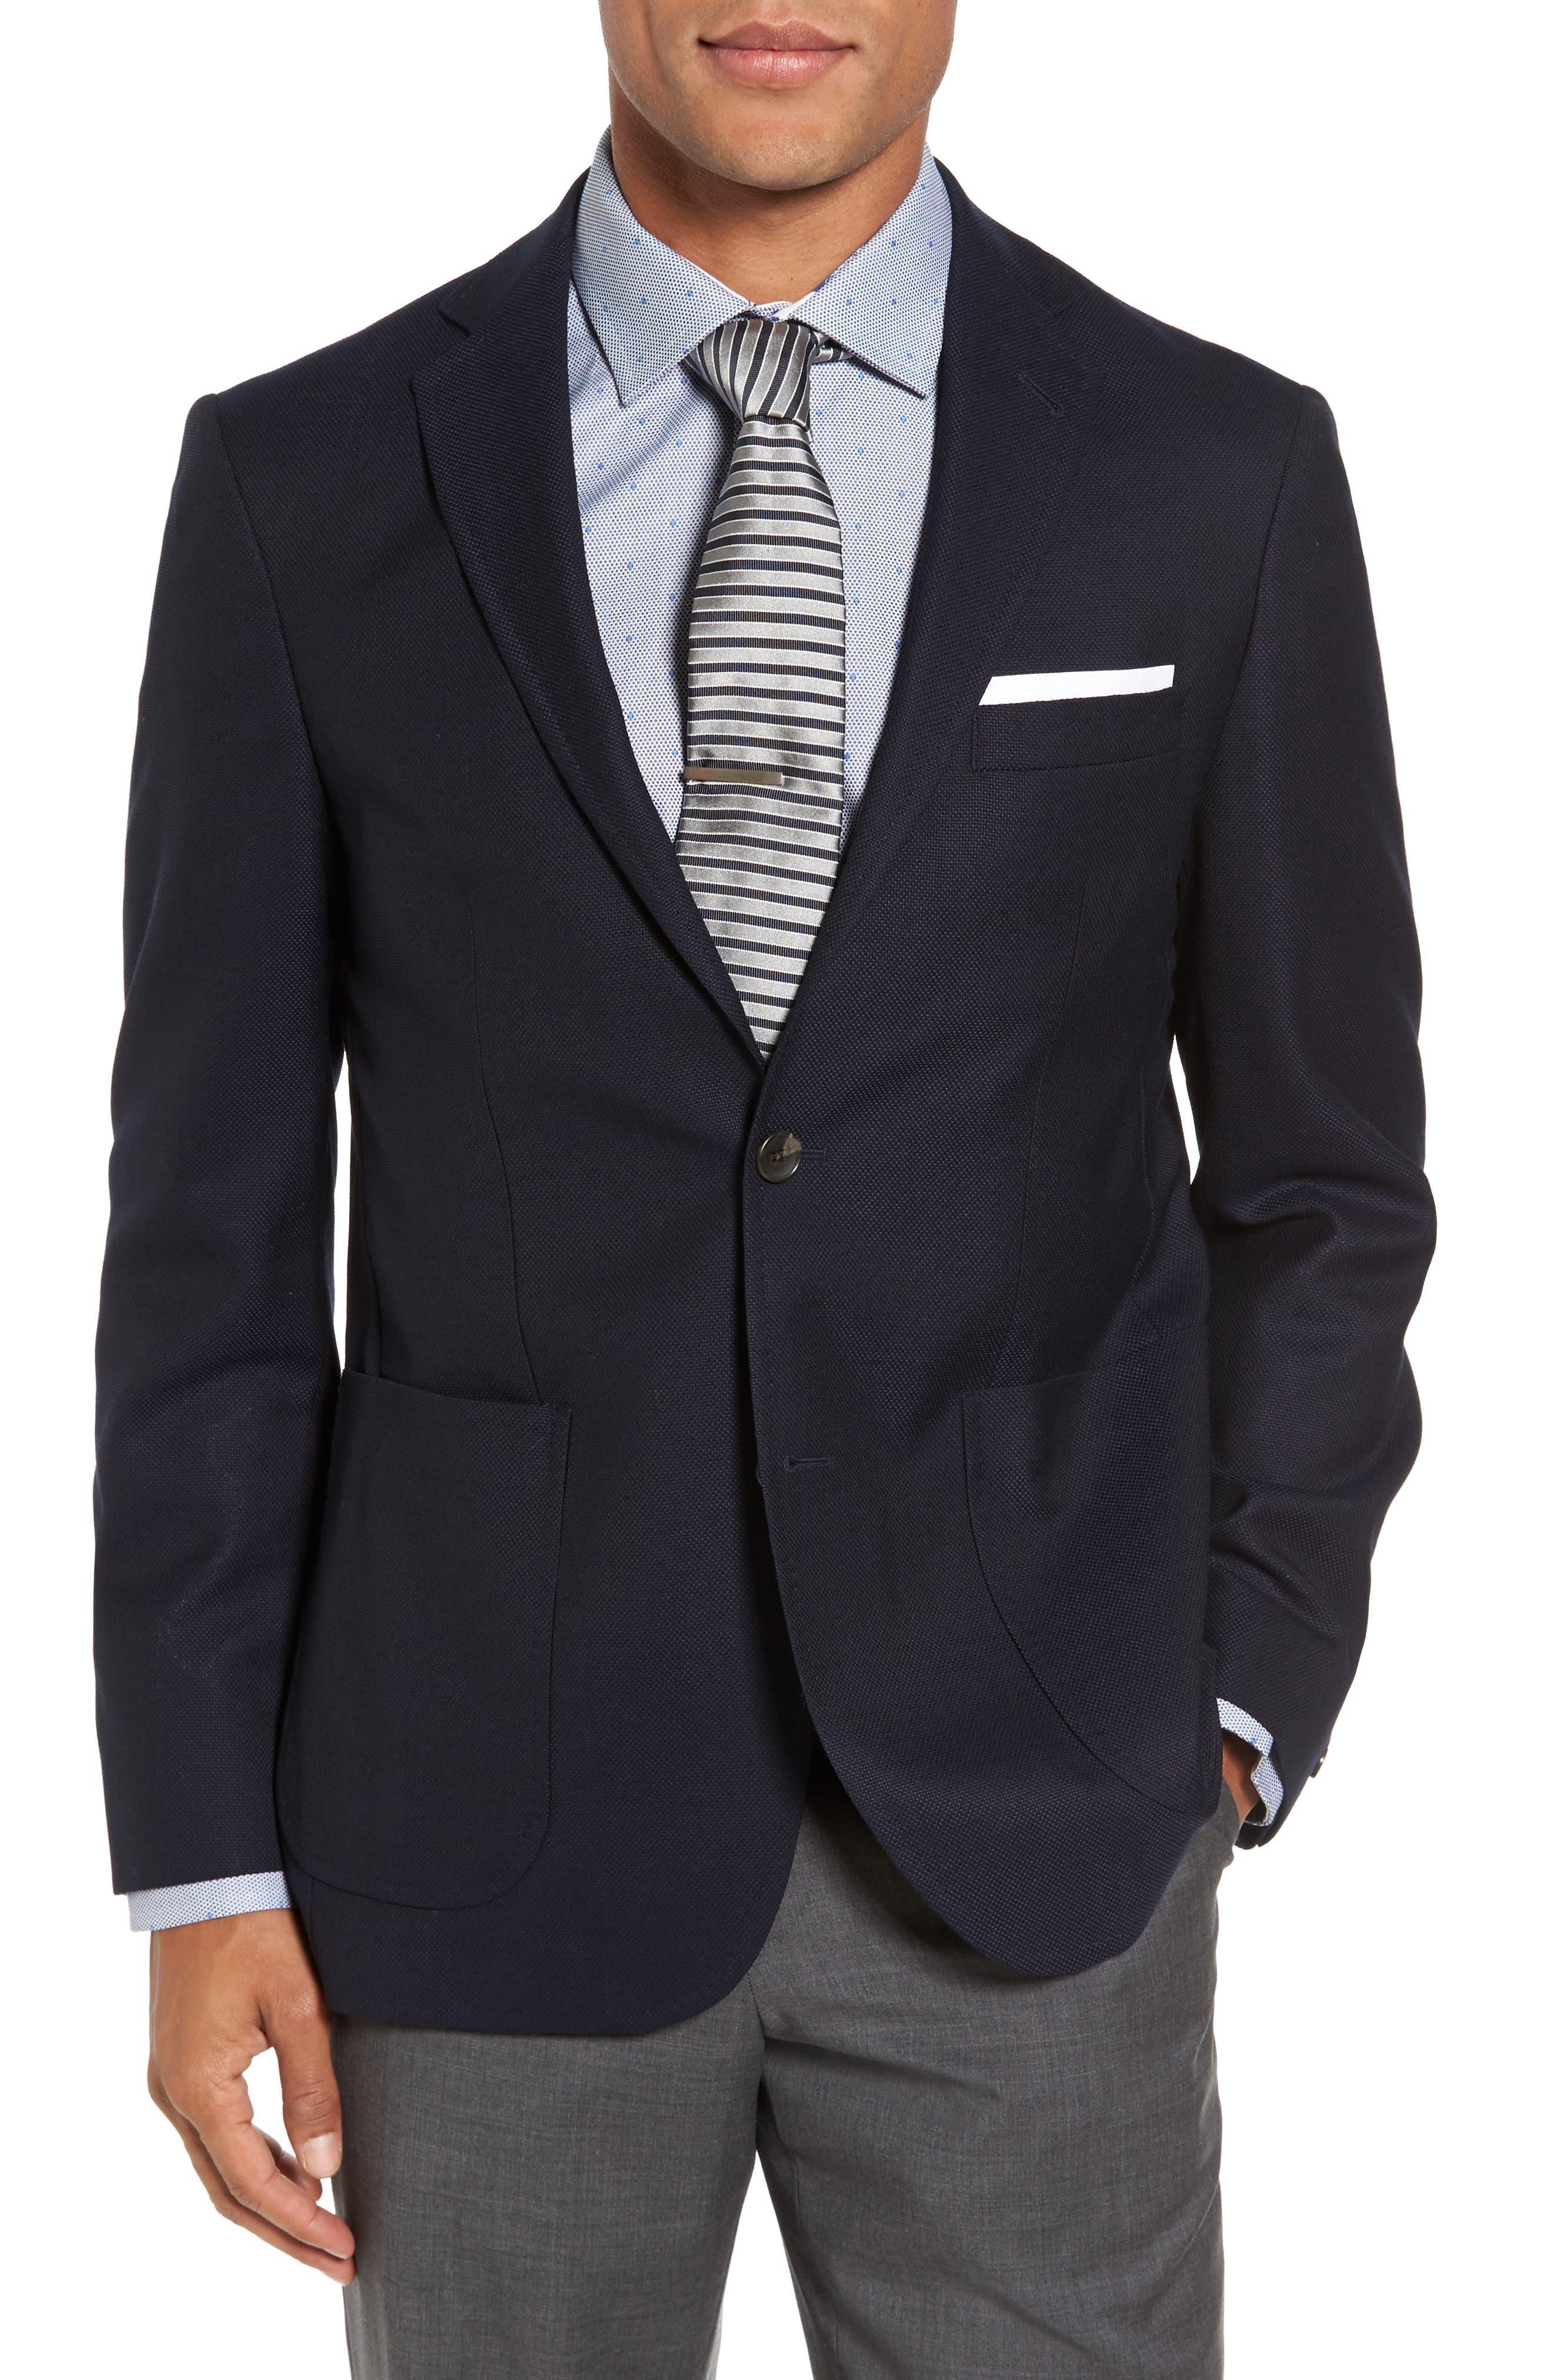 Vantage Trim Fit Wool Blazer,                         Main,                         color,